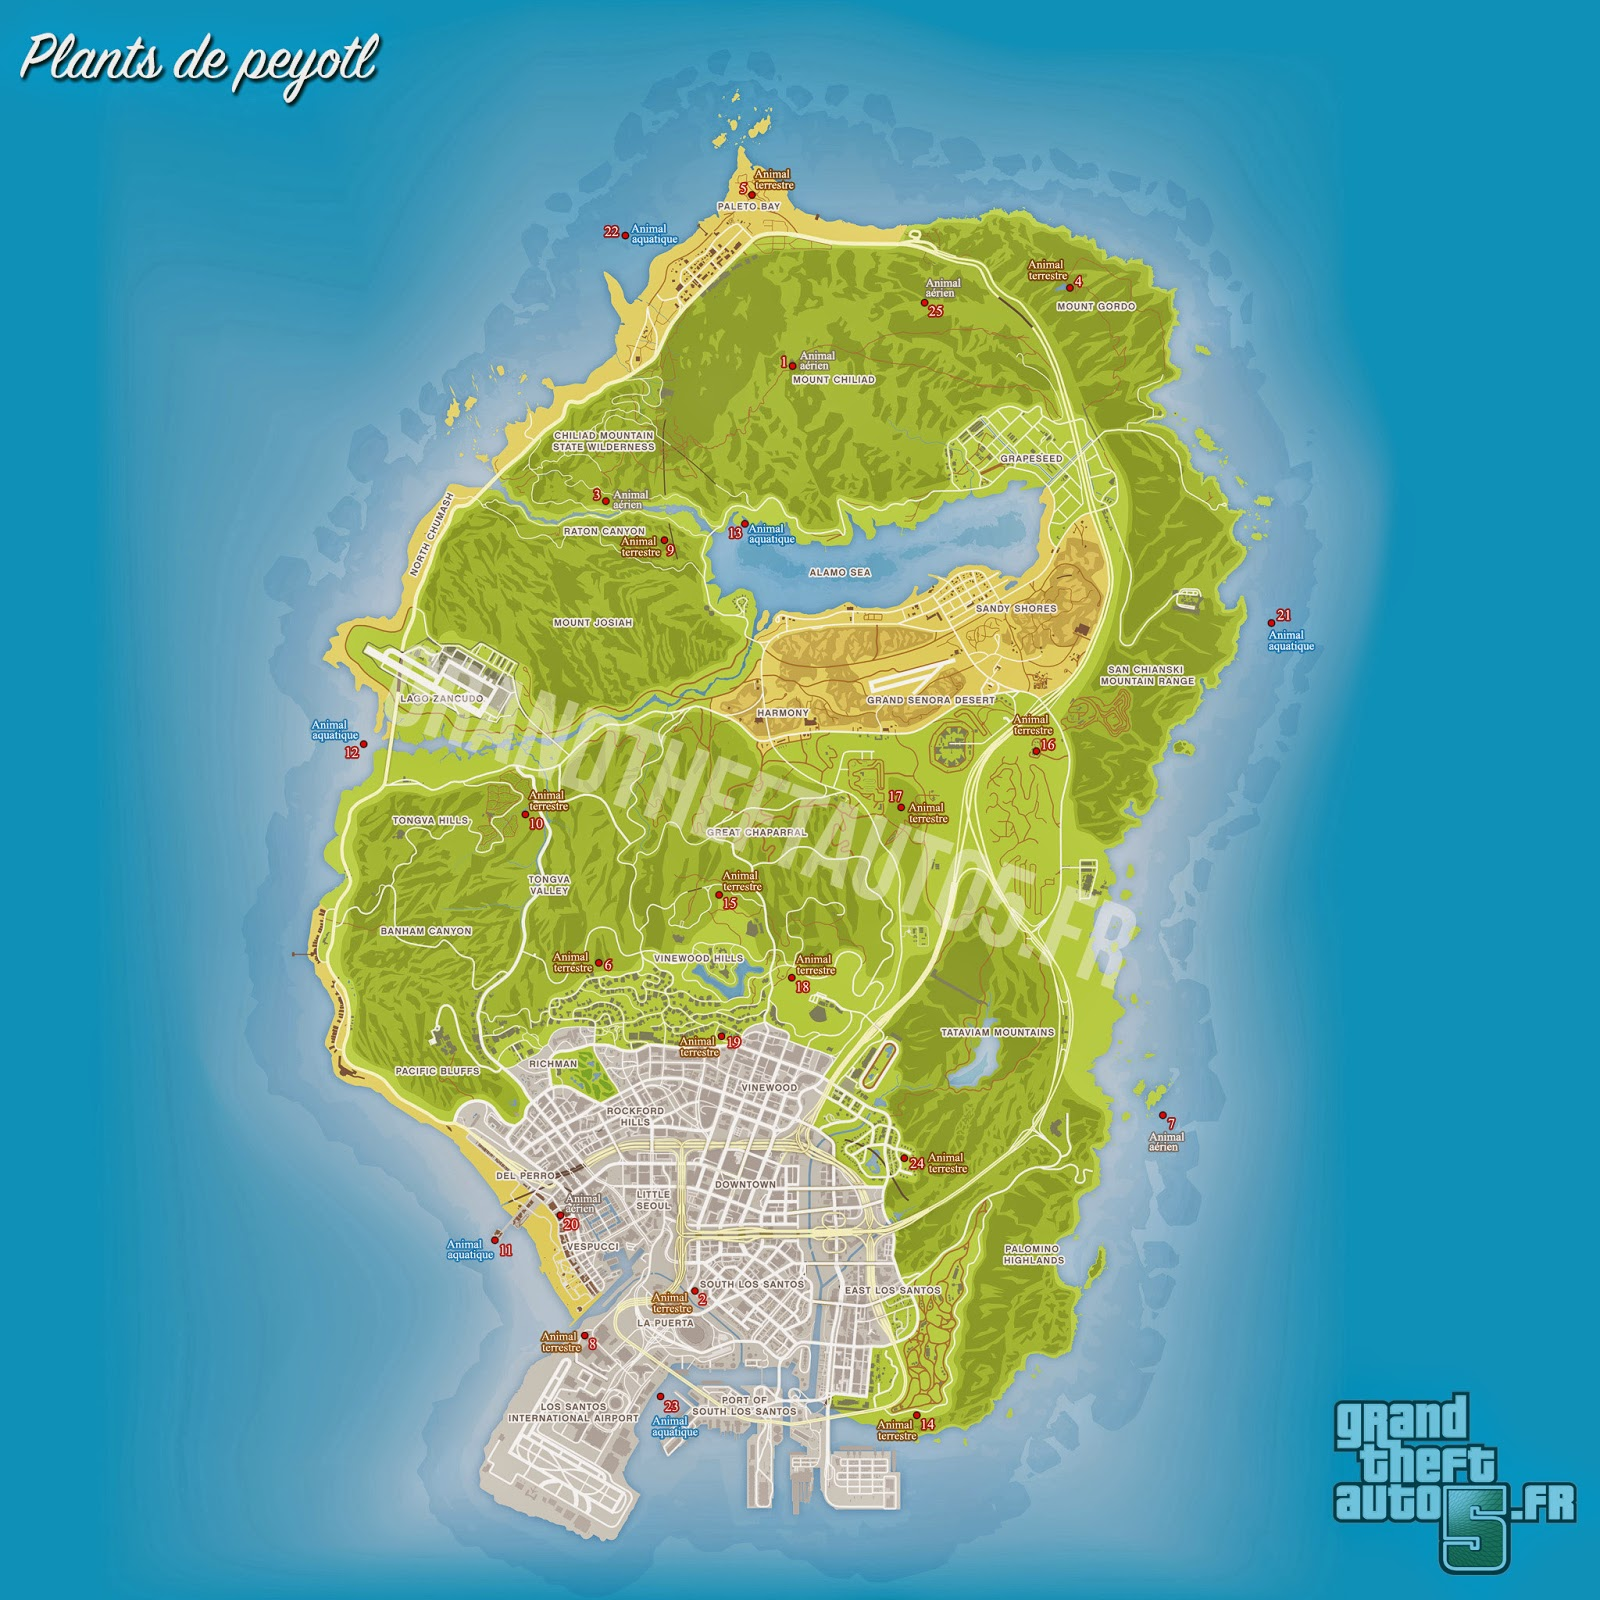 Personnages de Grand Theft Auto IV Wikip dia